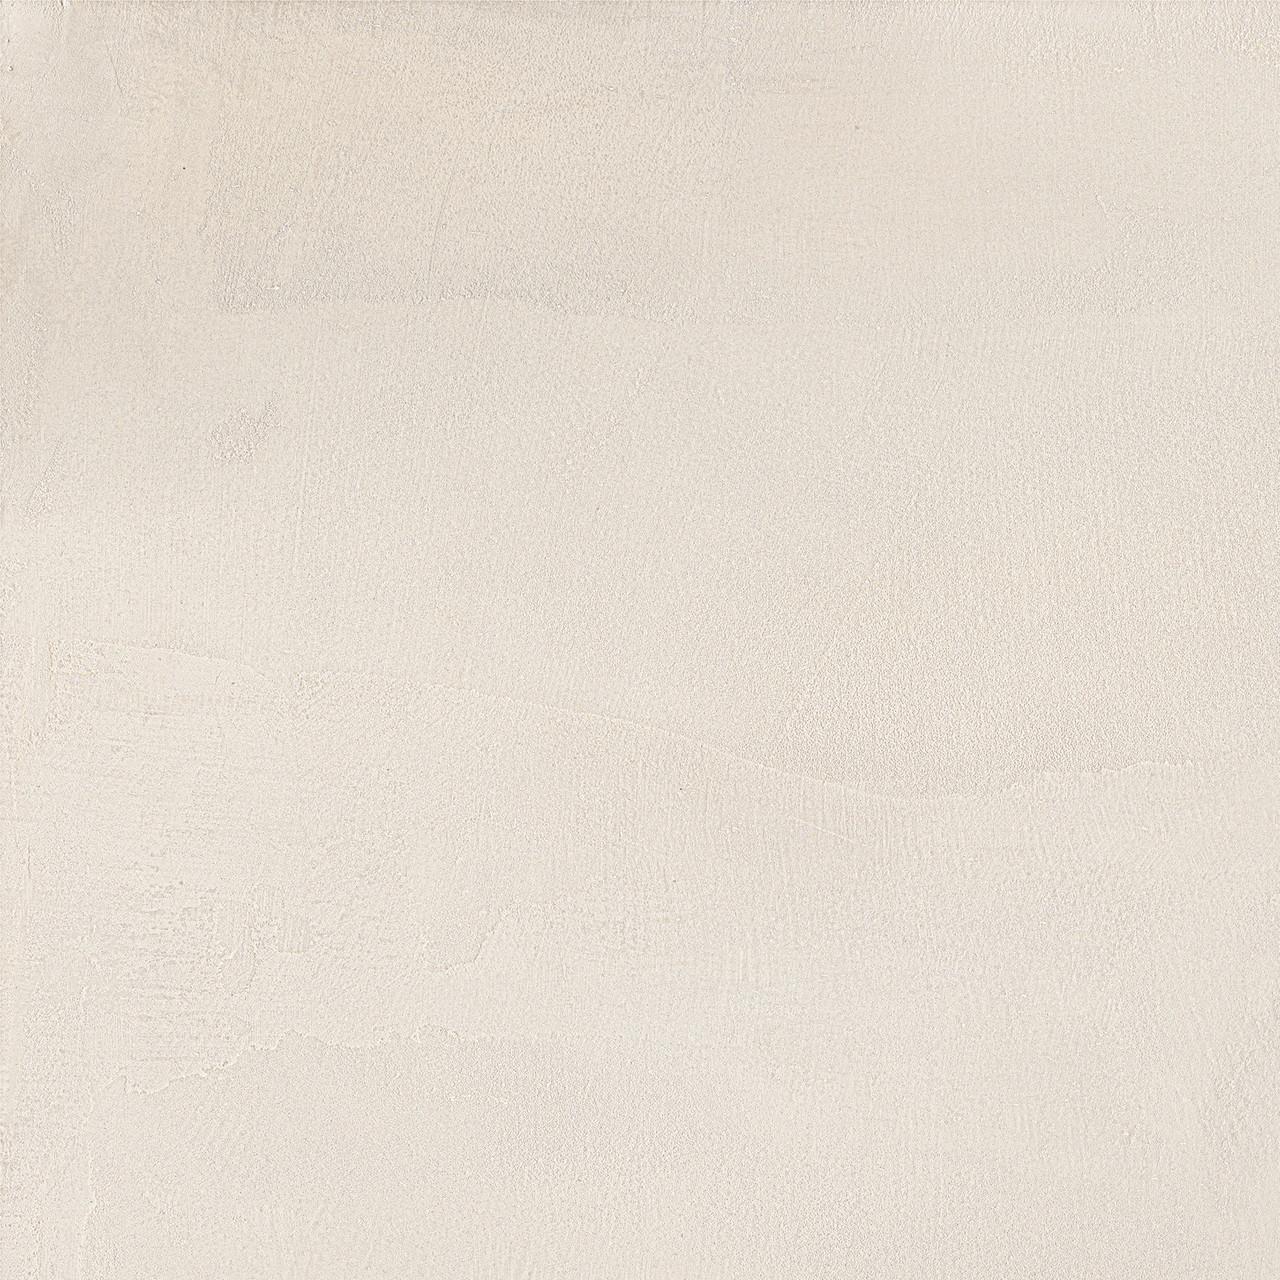 Плитка для пола LIMESTONE BEIGE  604*604 мм